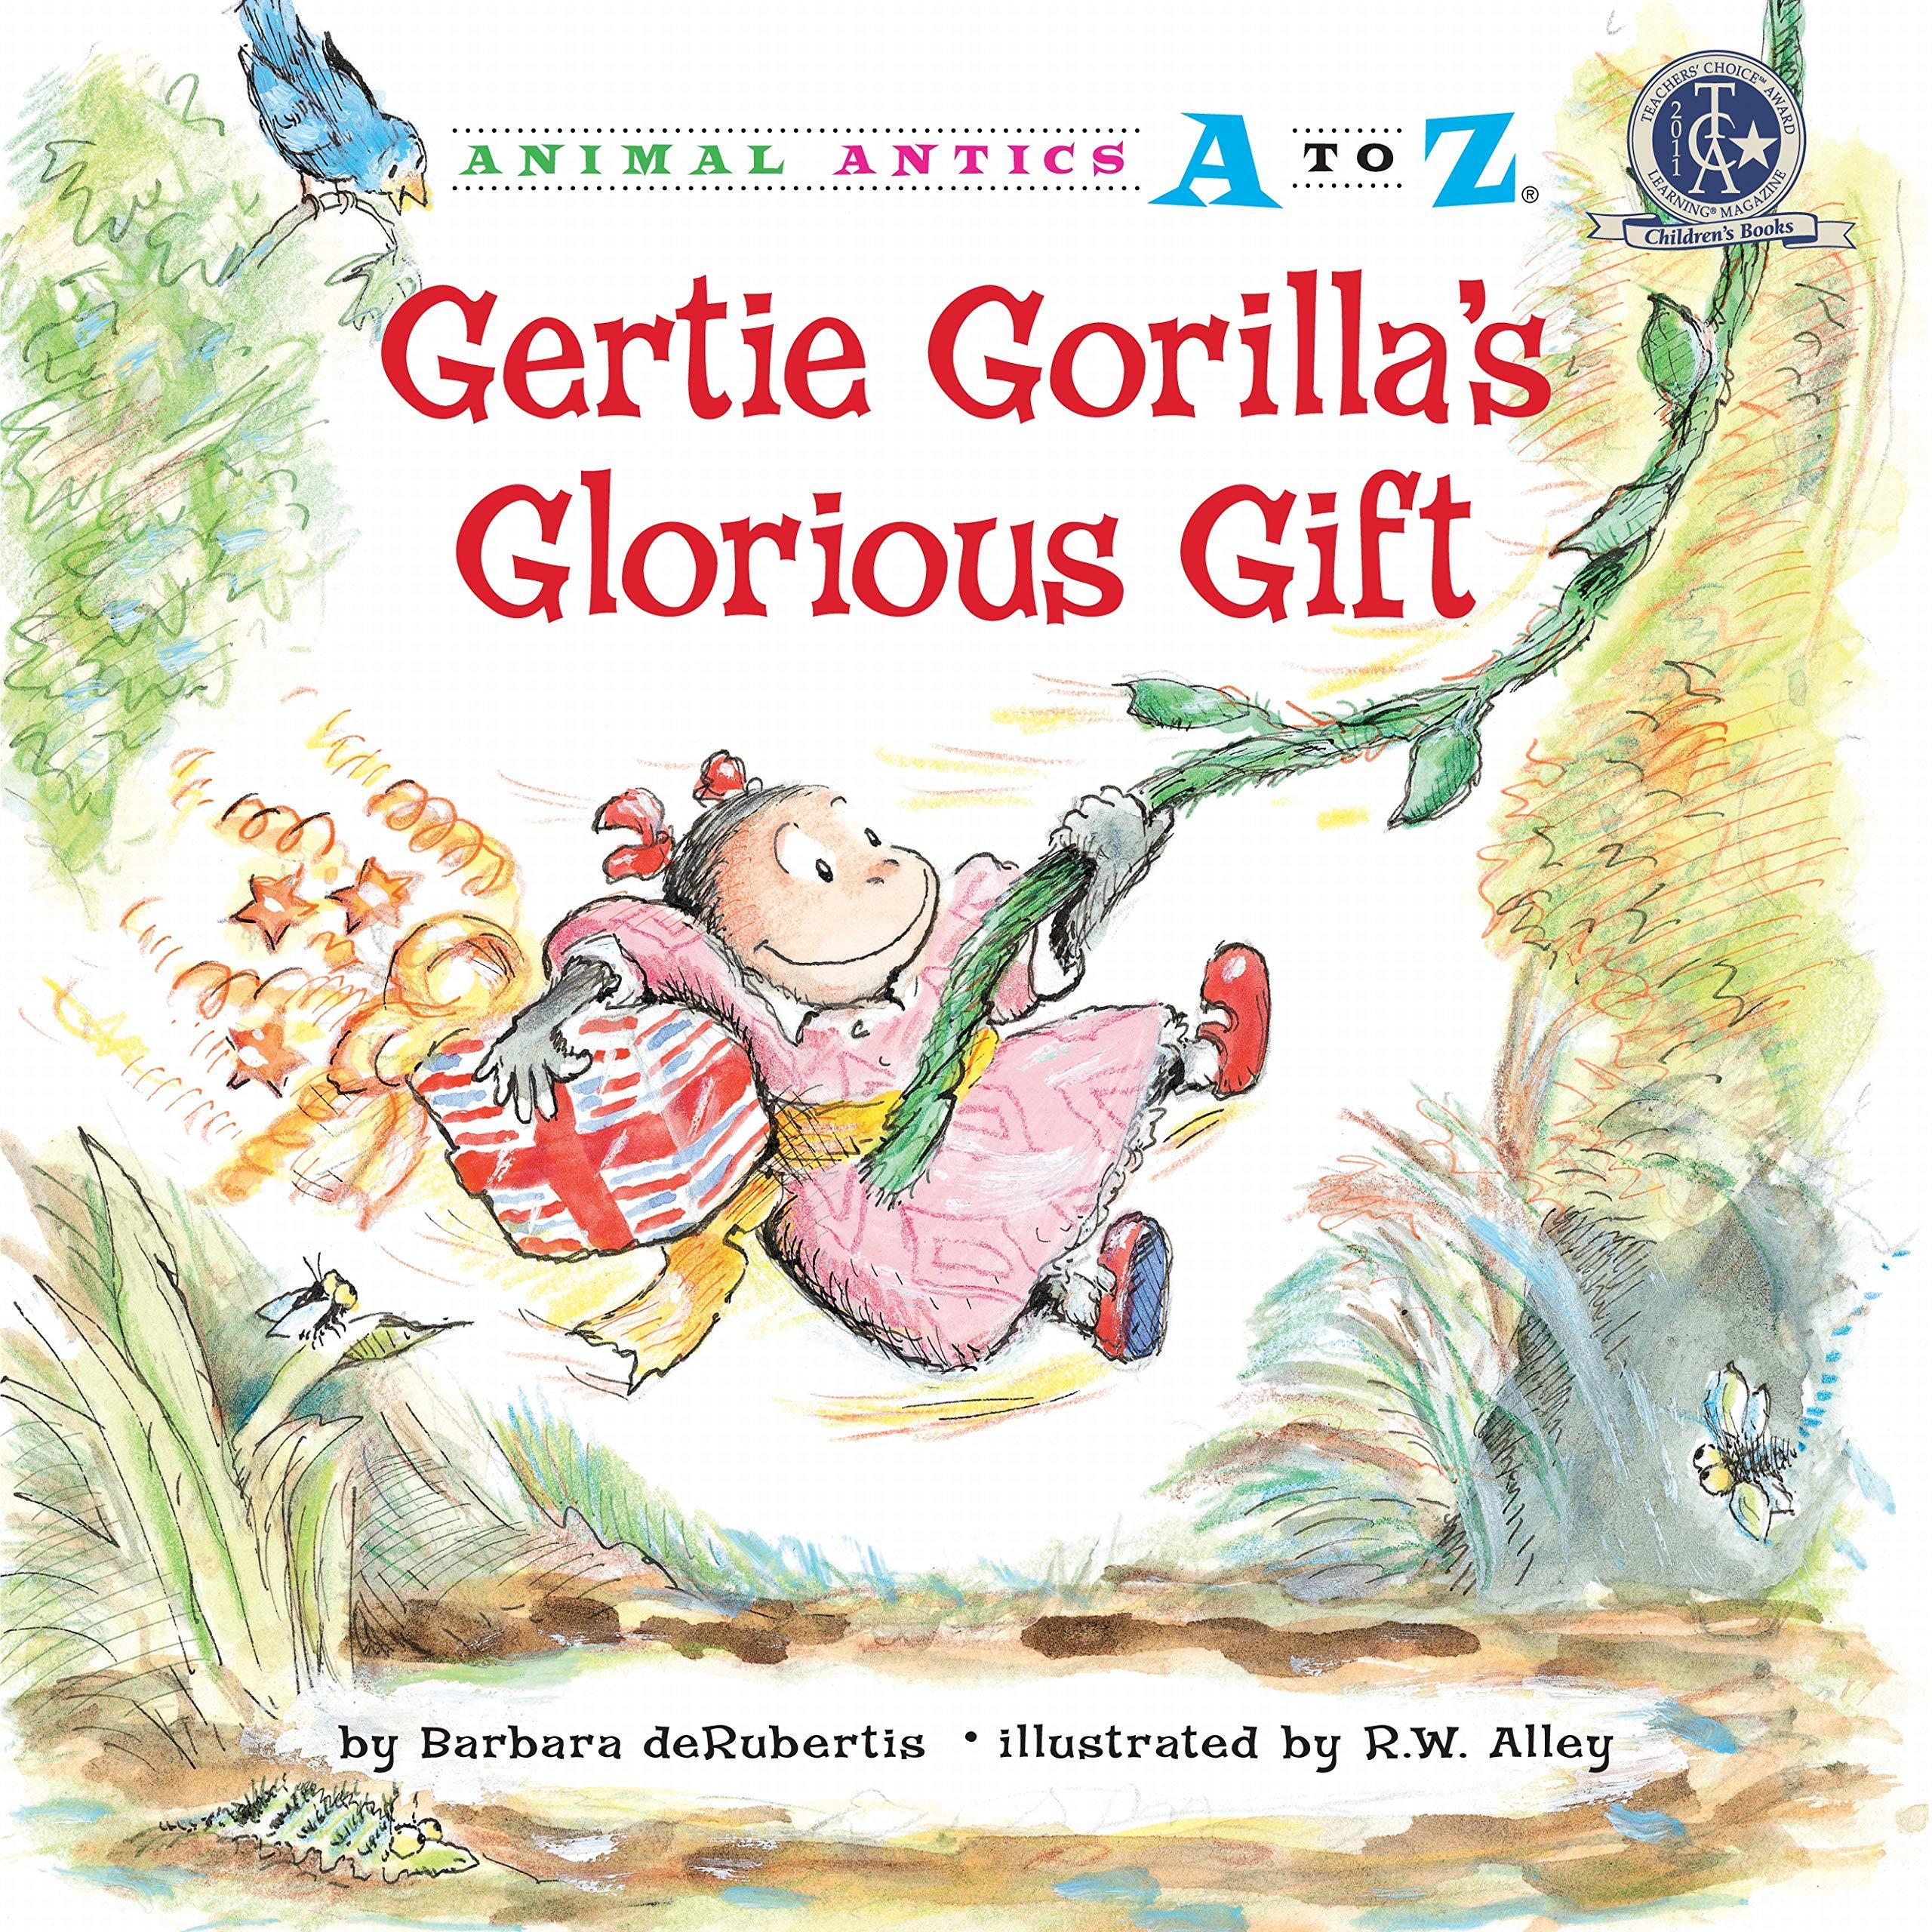 Read Online Gertie Gorilla's Glorious Gift (Animal Antics A to Z) pdf